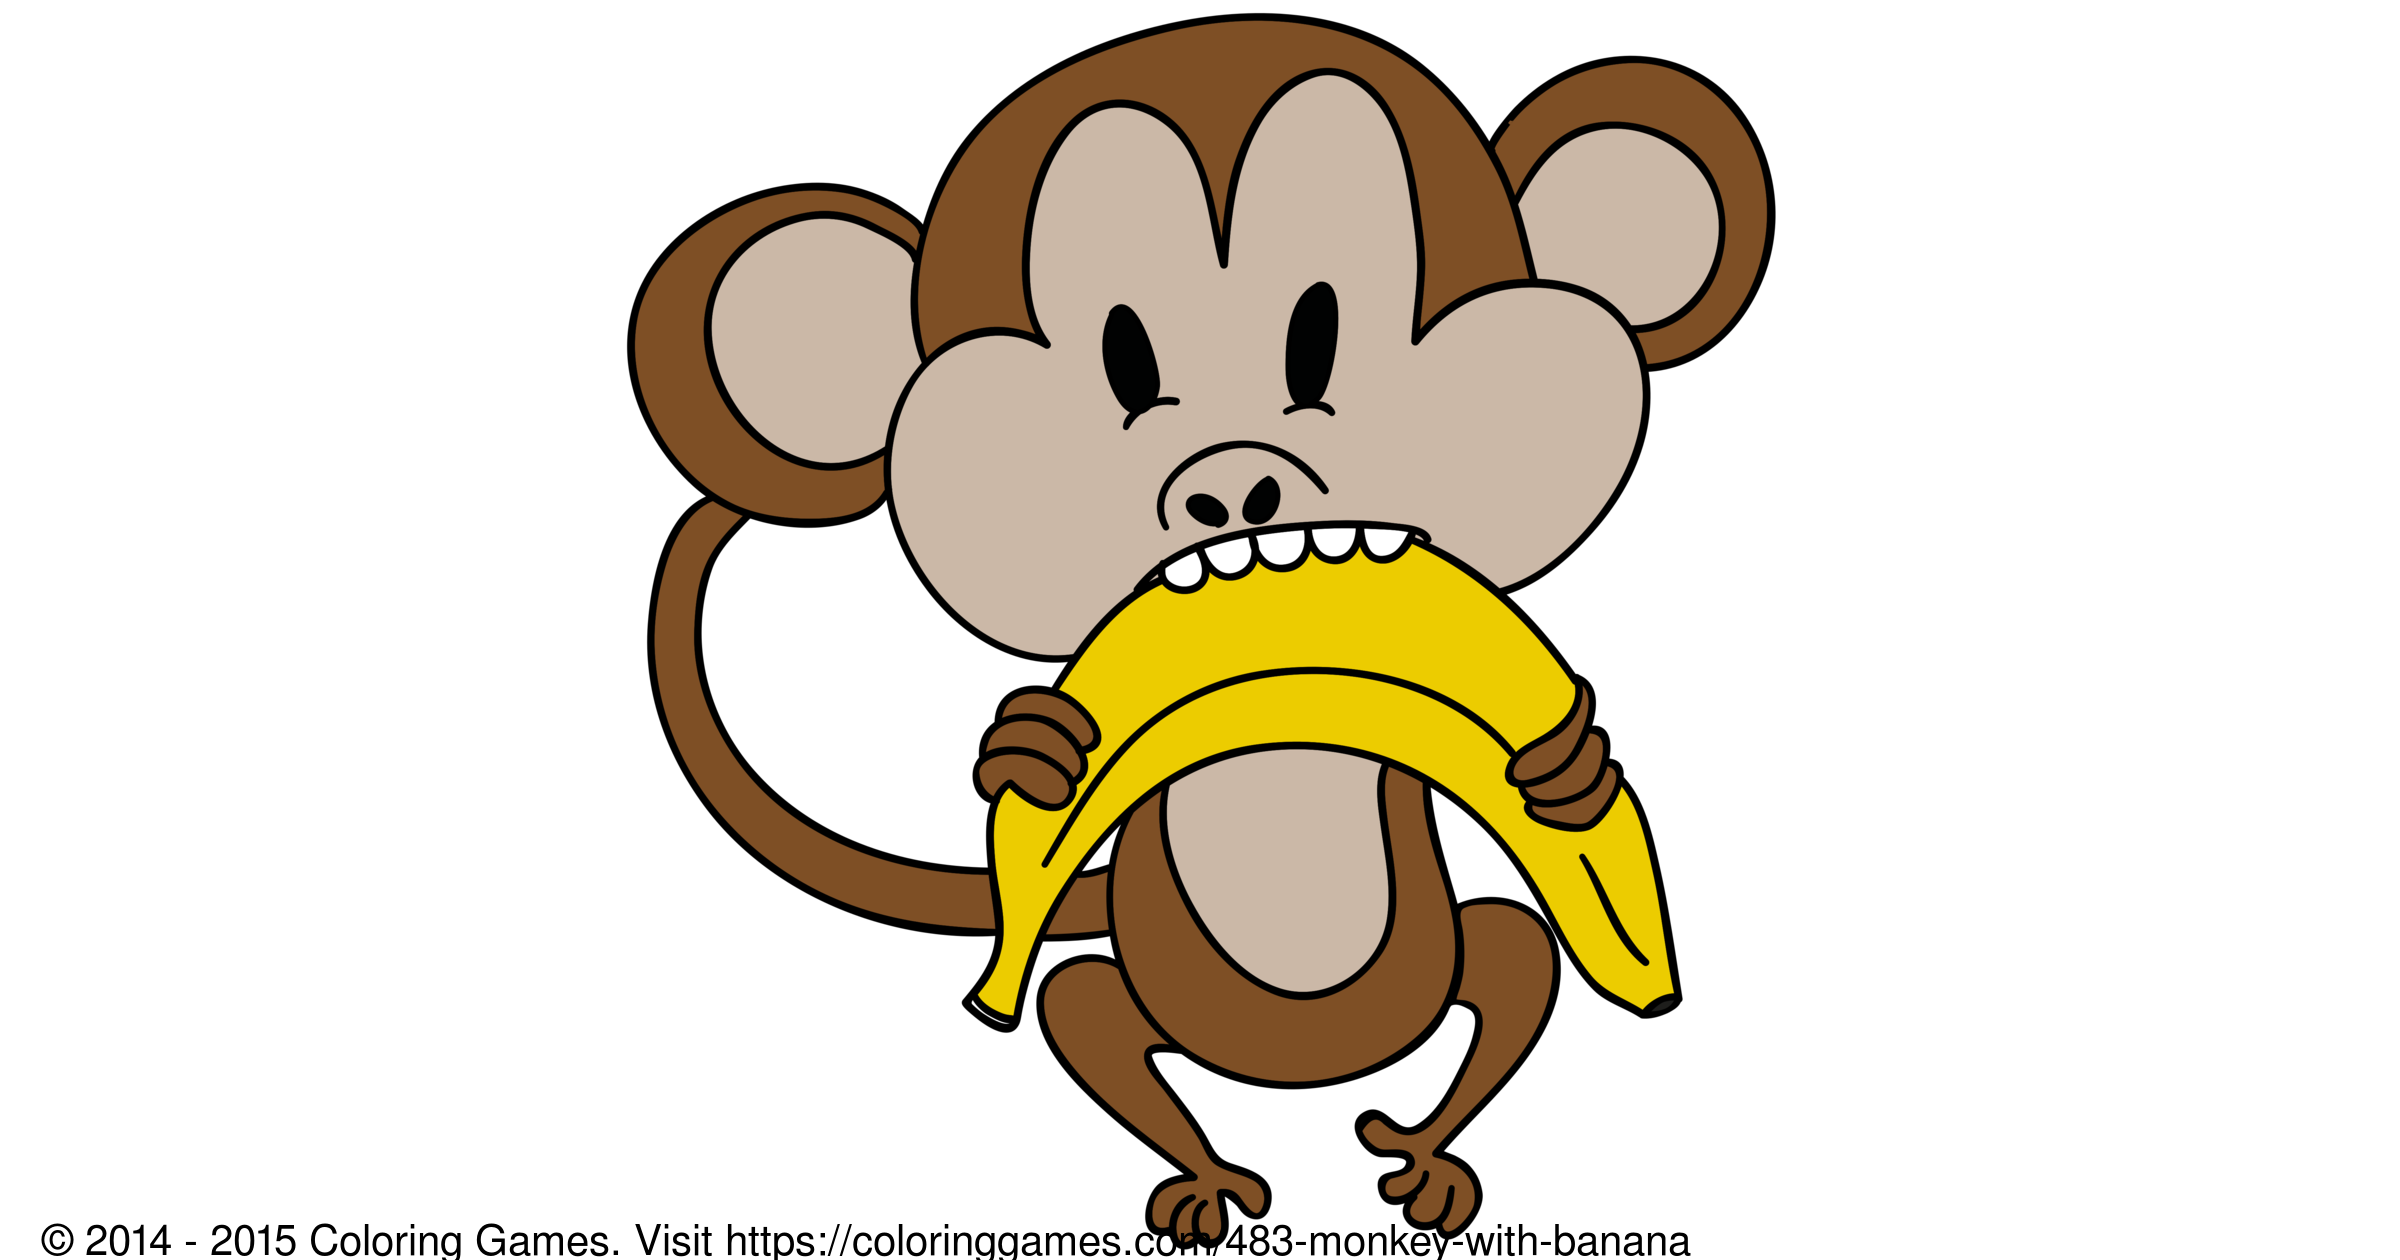 Monkey With Banana Boyama Oyunlari Ve Boyama Sayfalari